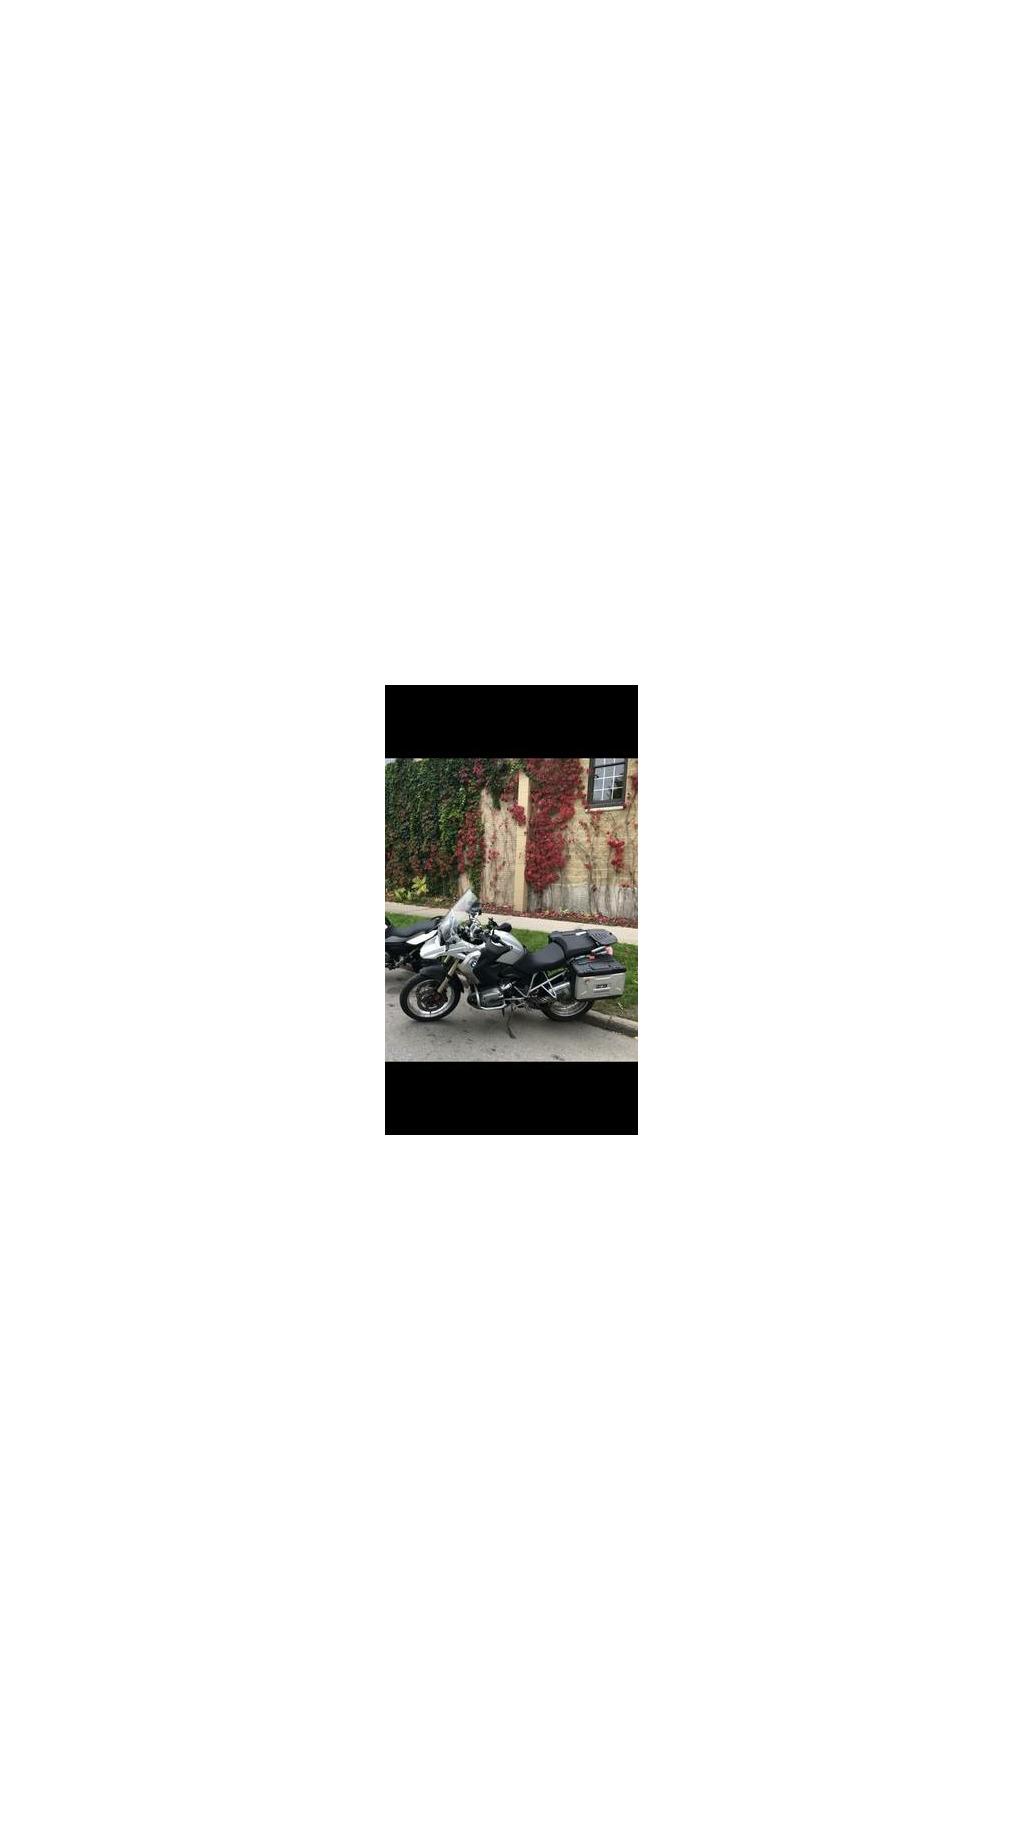 ordinary grand rapids bmw motorcycle #4: 58b5f205055cfe70c560a83d